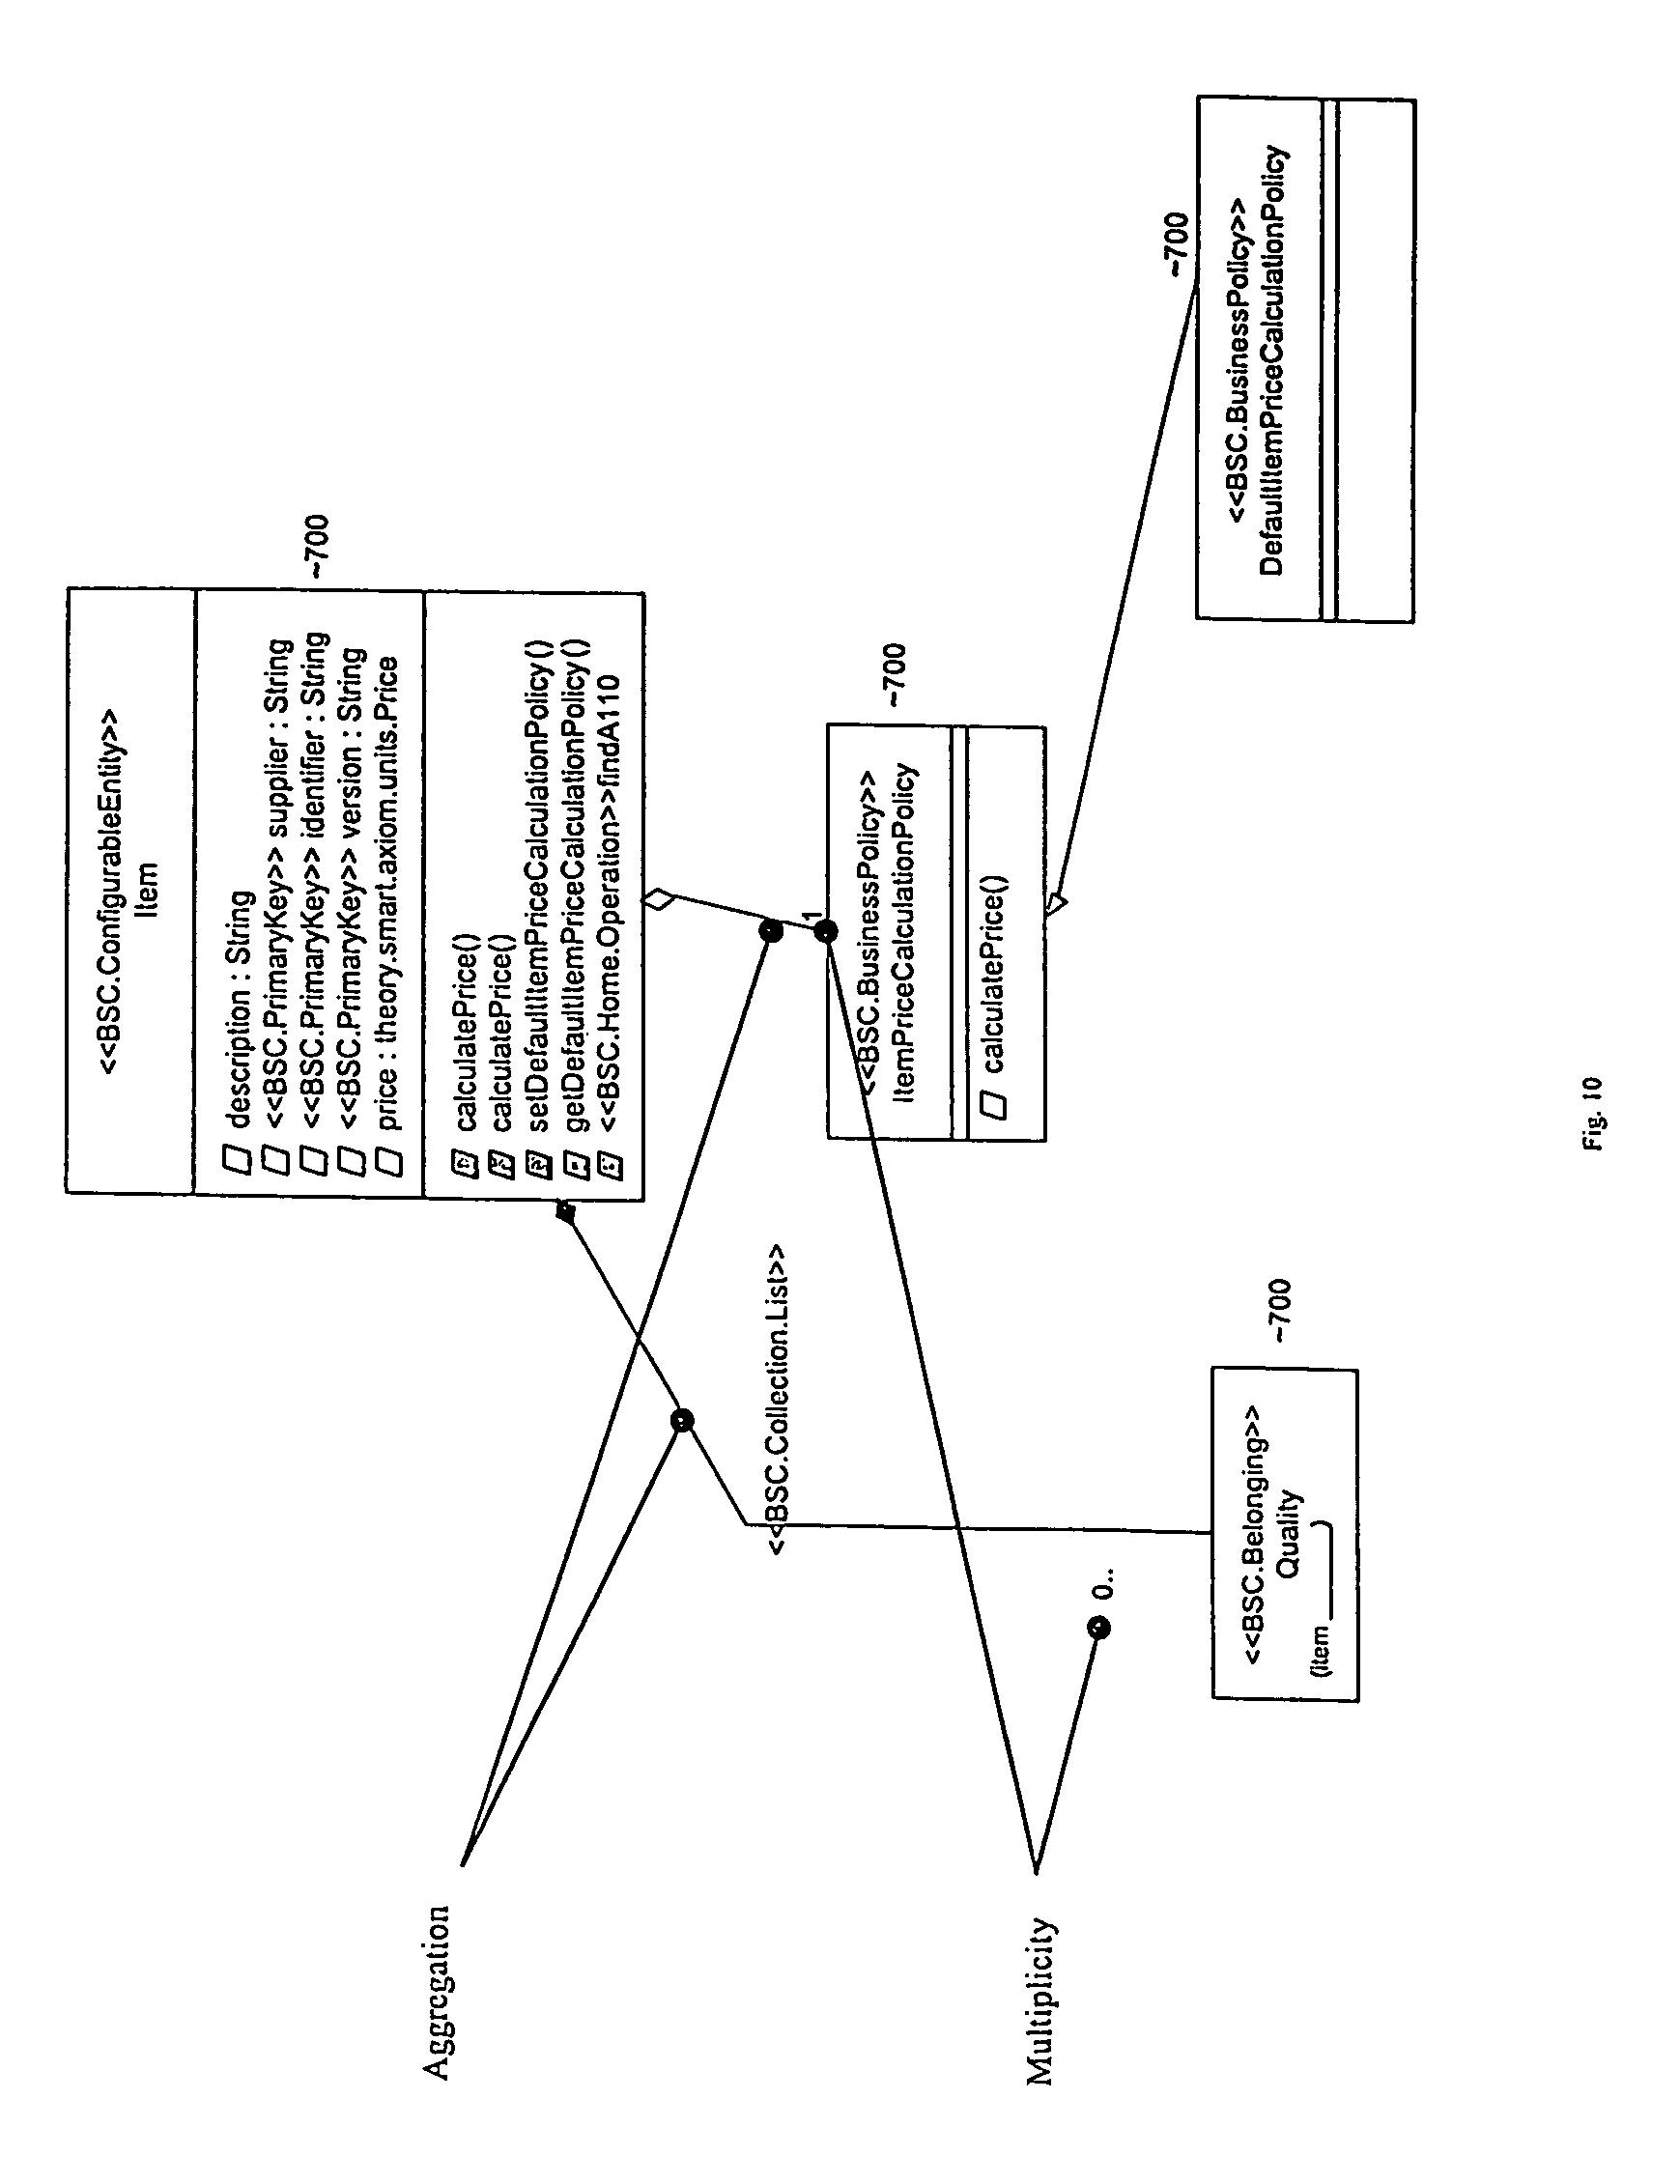 patent us7404175 - smart generator